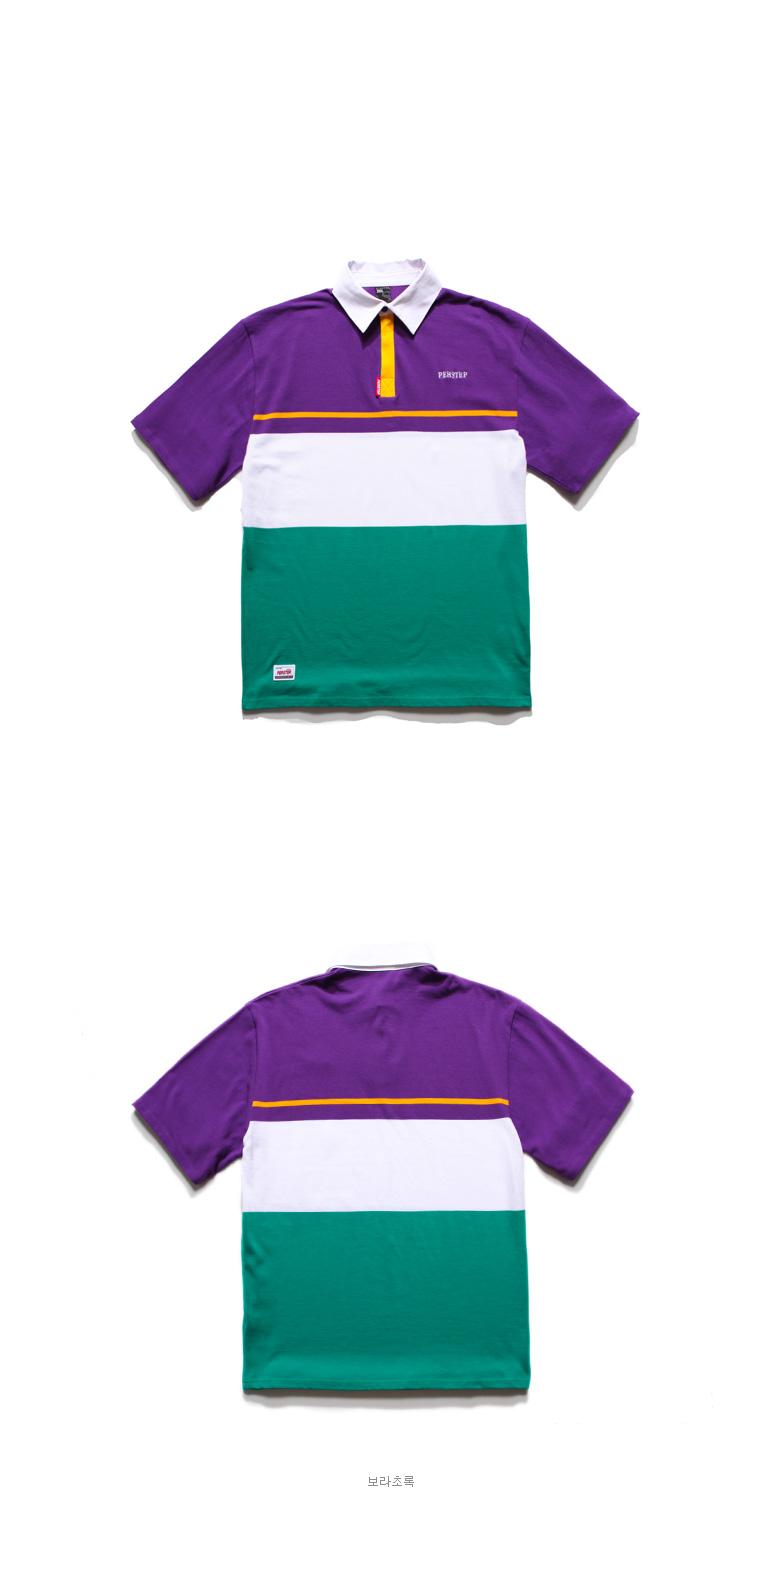 20180509_ps_boatcollar_tshirt_purplegreen_uk_01.jpg